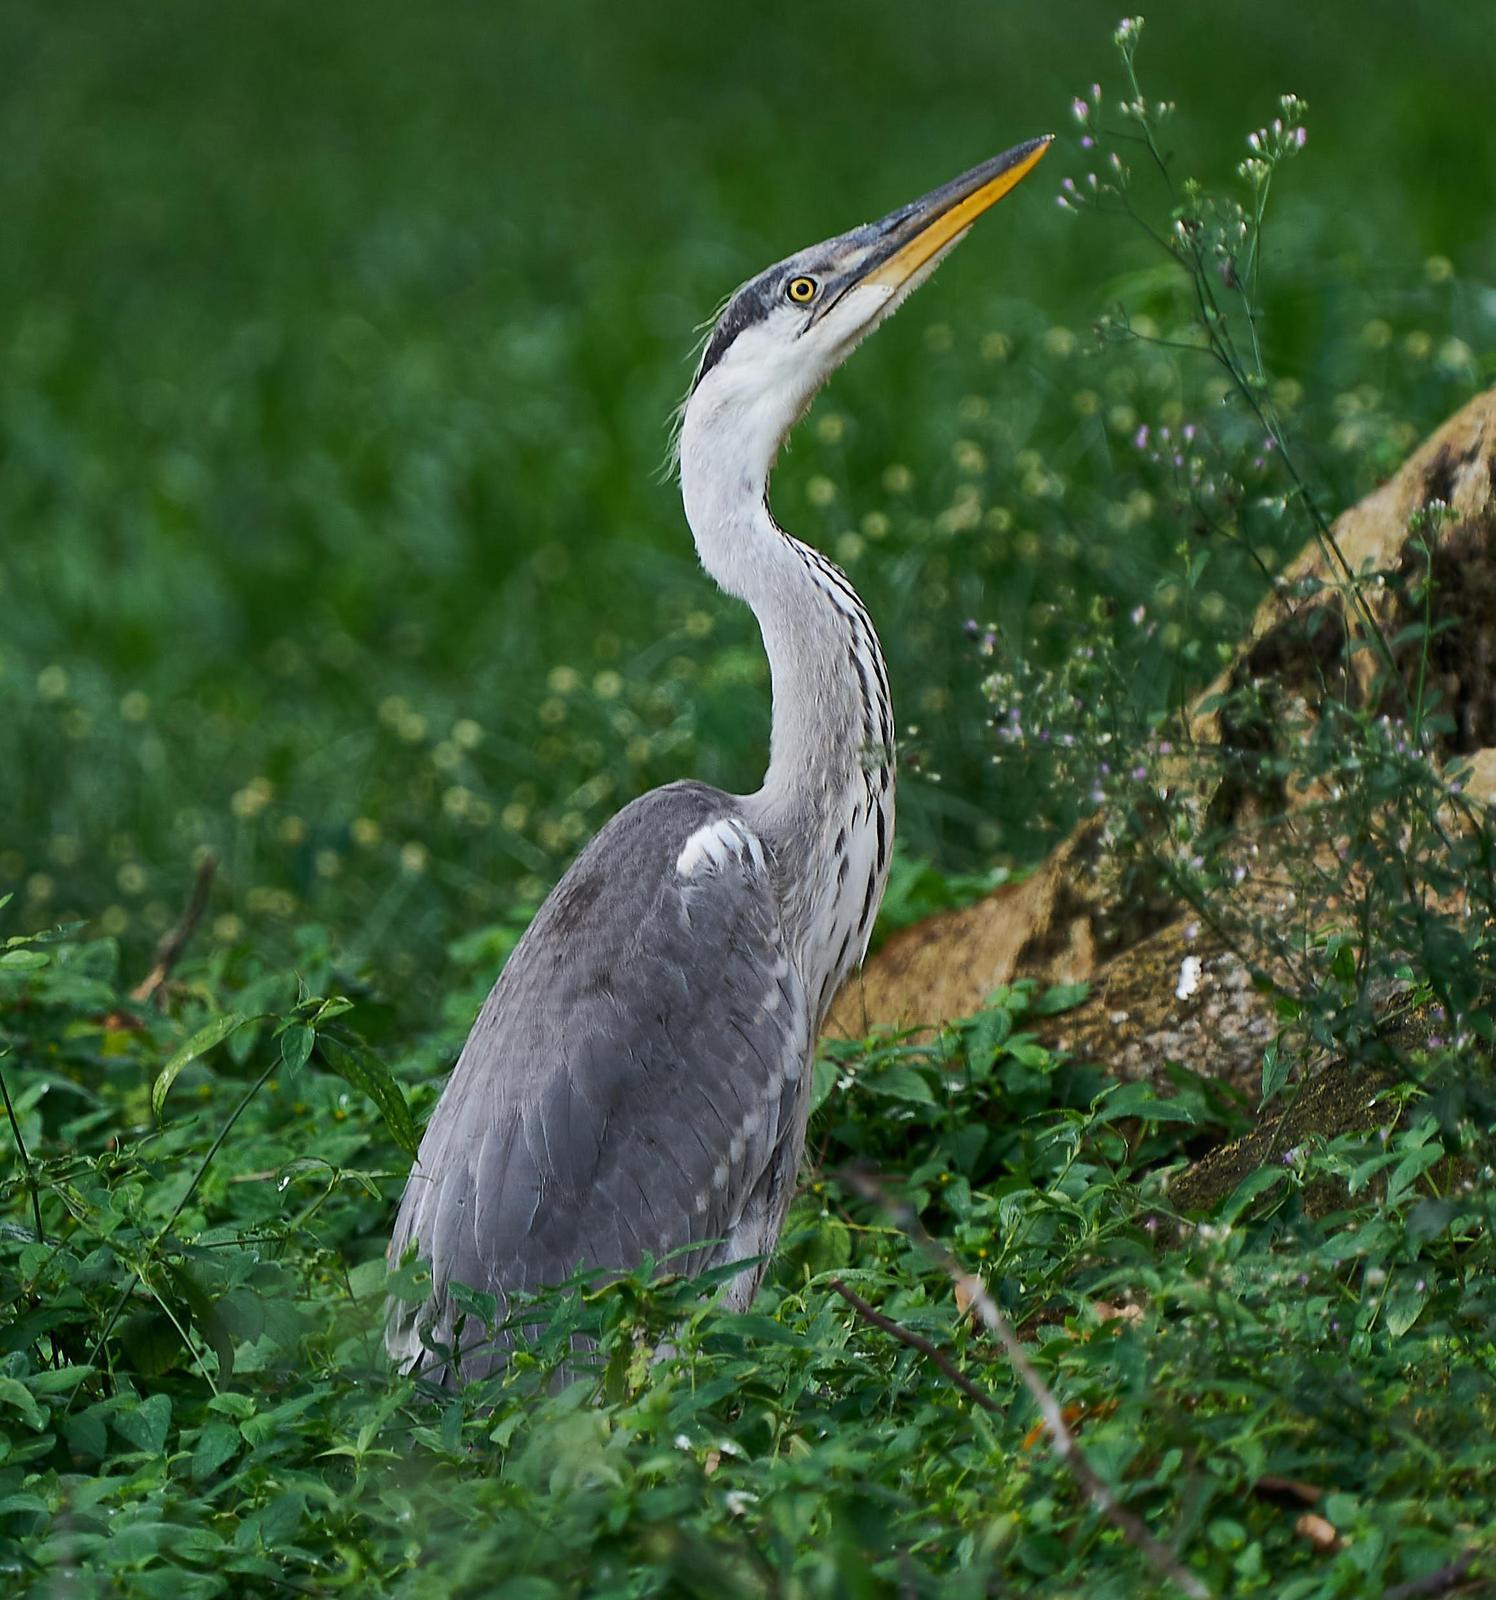 Gray Heron Photo by Steven Cheong